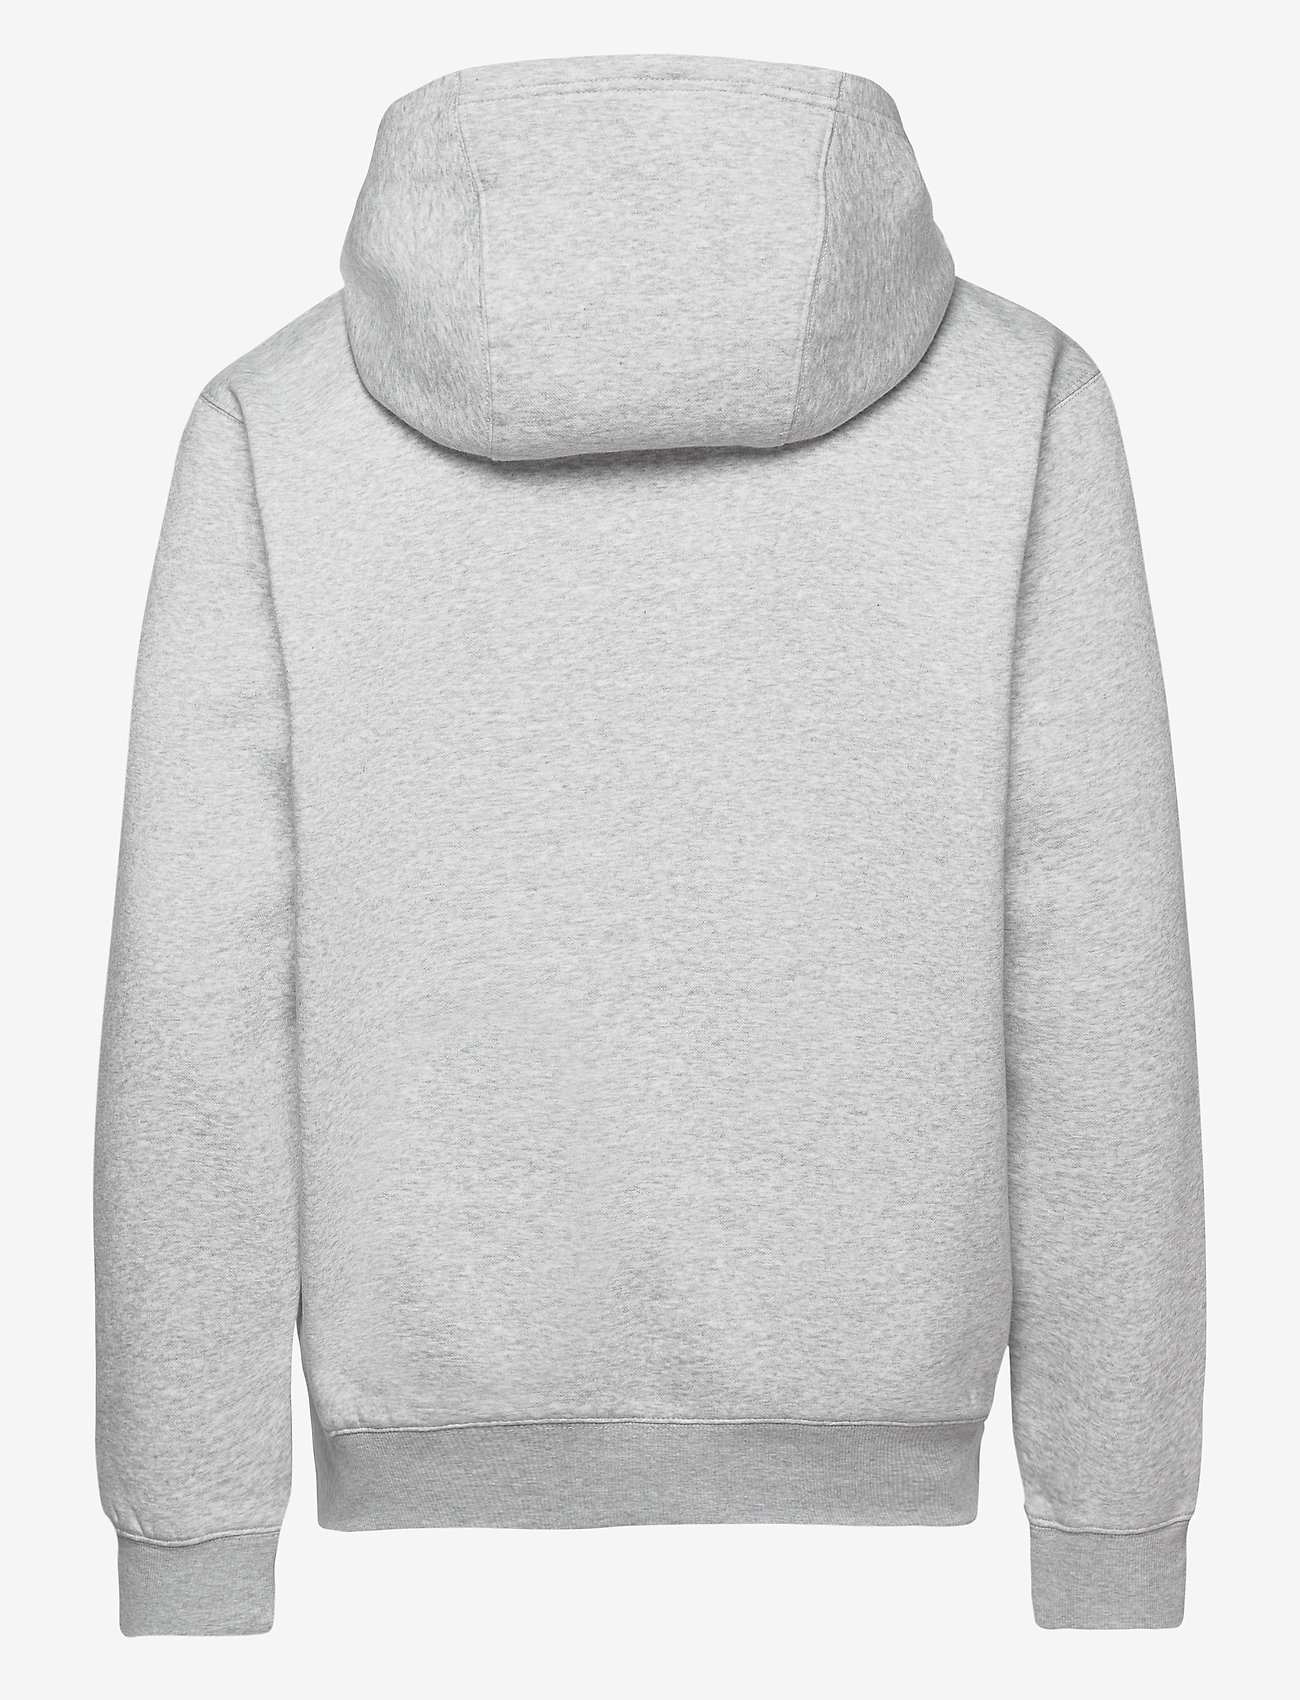 Tommy Jeans - TJM REGULAR FLEECE ZIP HOODIE - hoodies - lt grey htr - 1